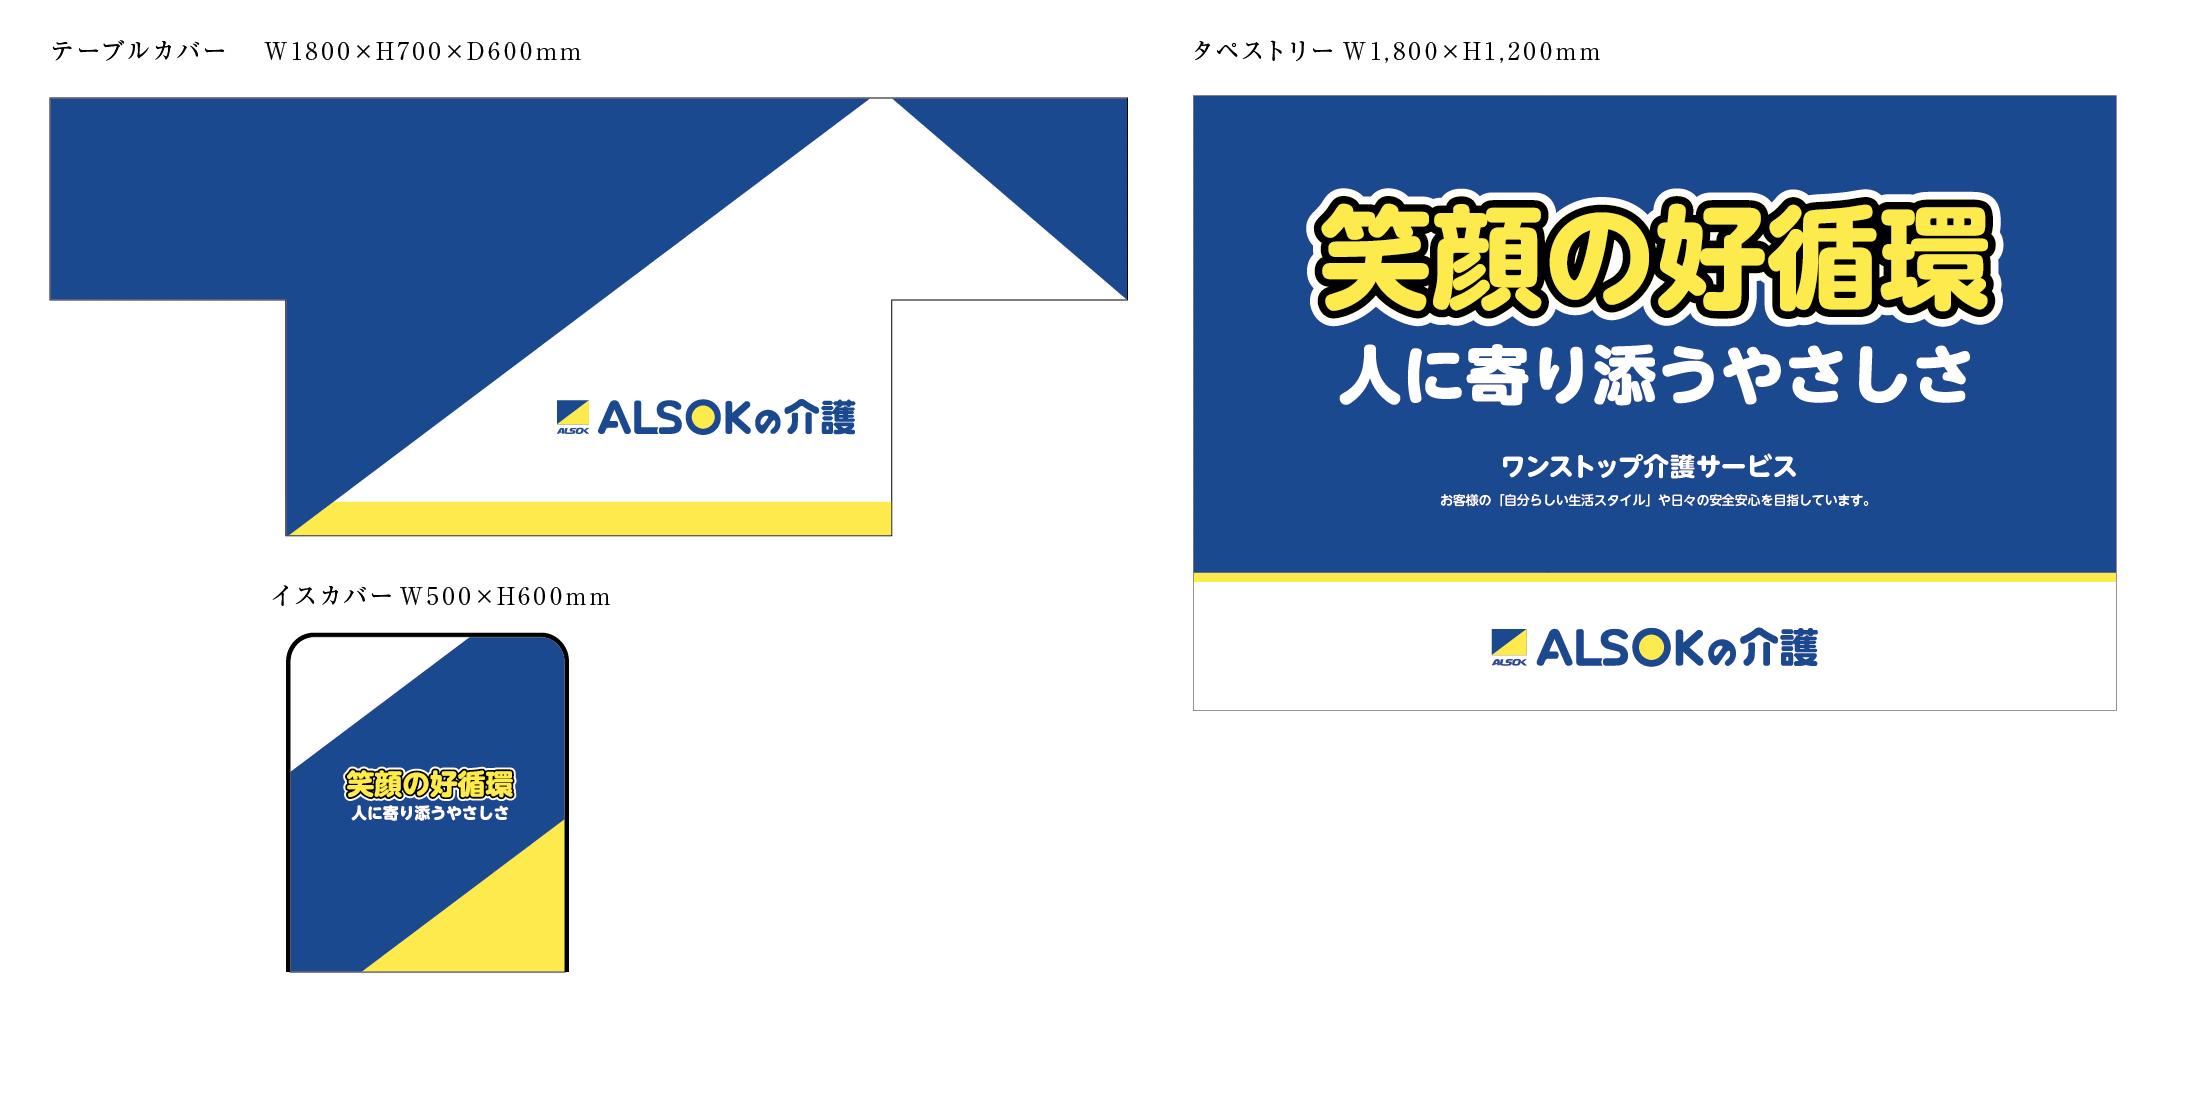 ALSOK介護様採用ブースデザイン